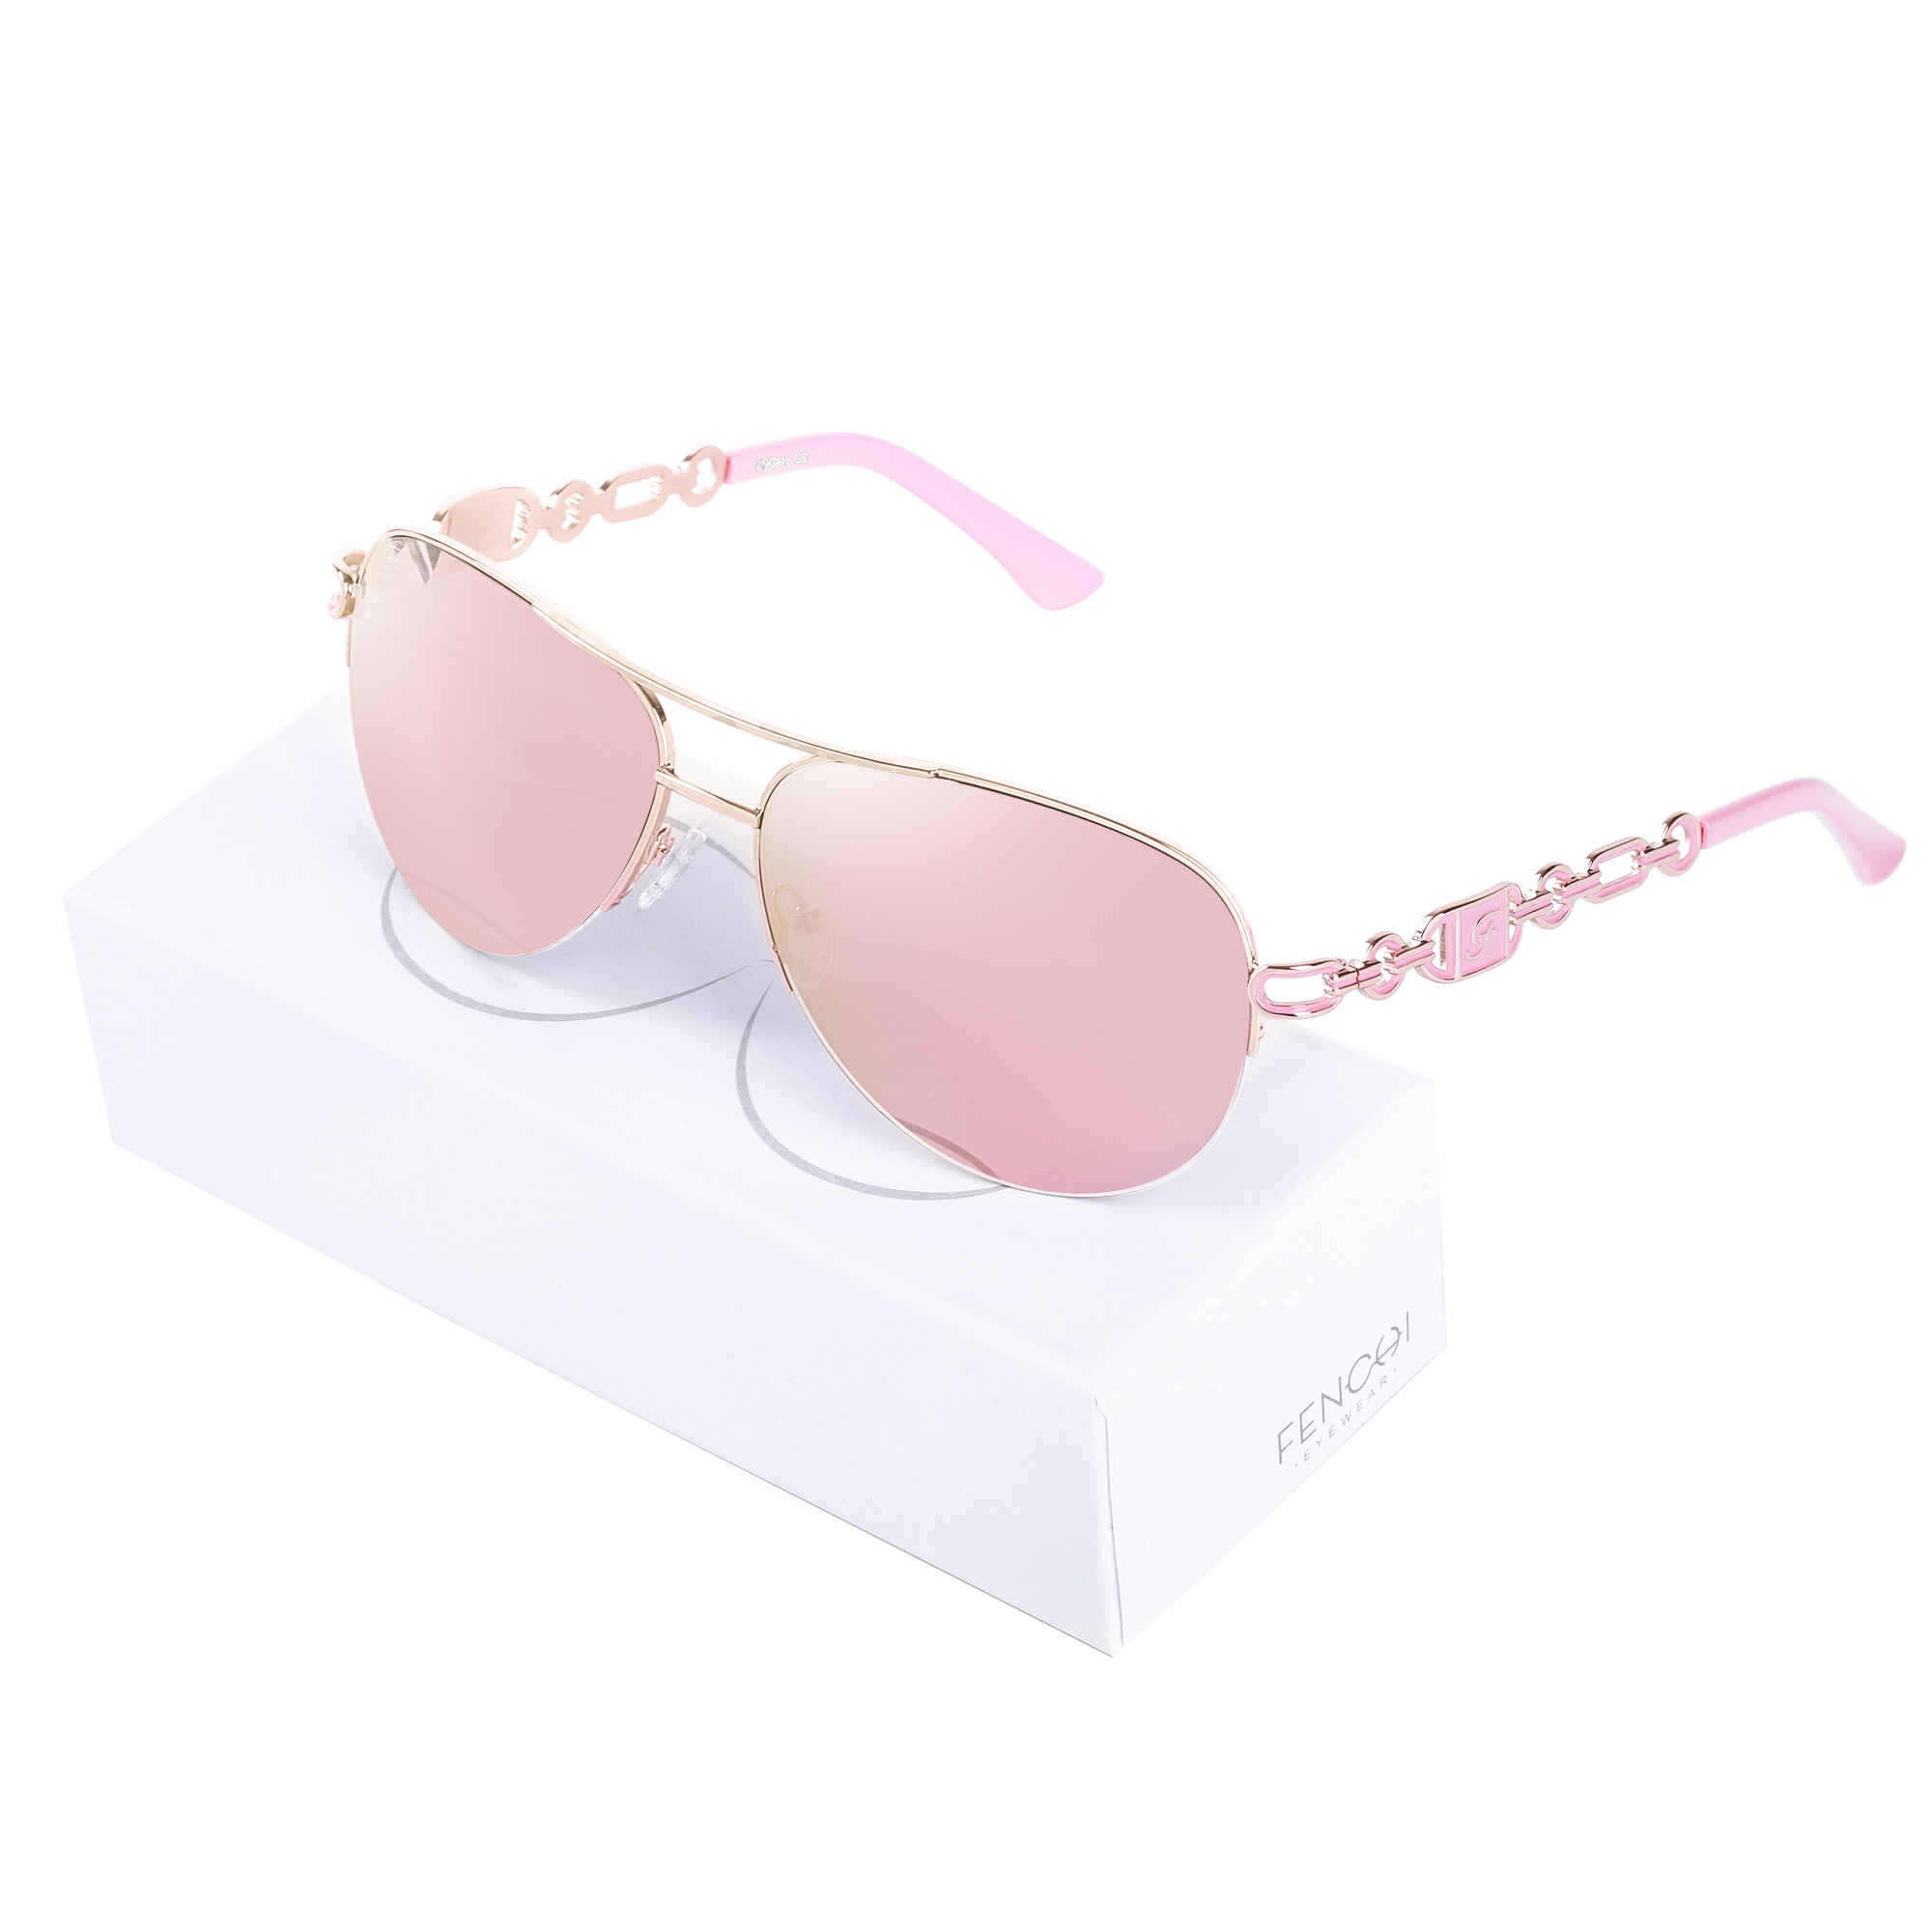 FENCHI Women Sunglasses Designer Trendy Brand Vintage Pink Mirror Sunglasses Ladies Cat Eye óculos De Sol Feminino